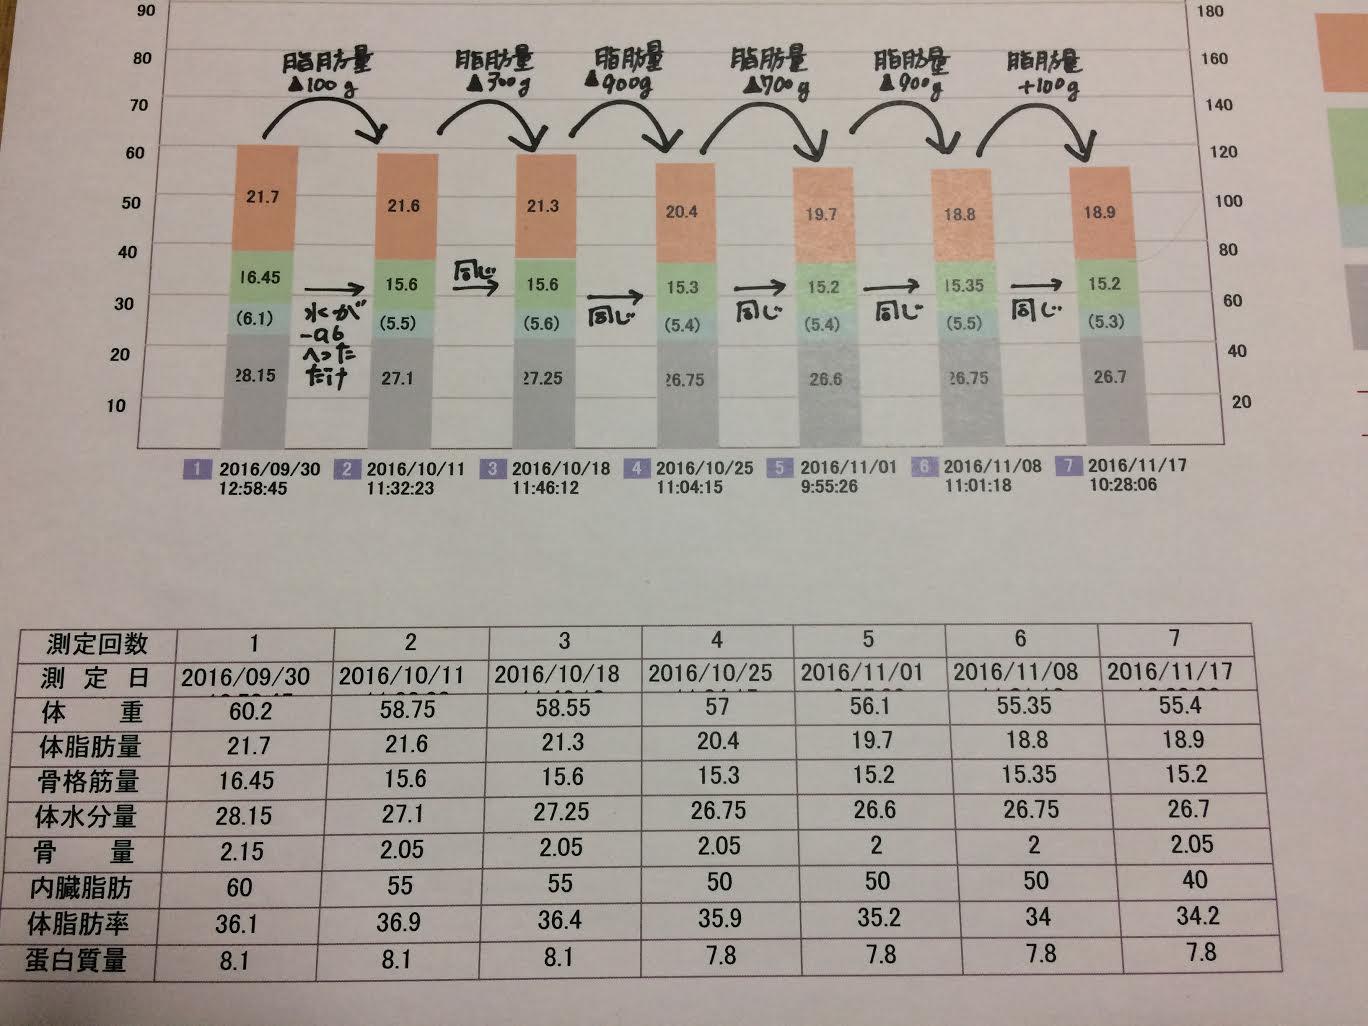 %e8%be%b0%e5%b7%b3%e3%81%95%e3%82%93%ef%bc%99%e6%9c%88%ef%bc%93%ef%bc%90%e6%97%a5%ef%bd%9e%e3%81%ae%e6%8e%a8%e7%a7%bb%e3%82%b0%e3%83%a9%e3%83%95